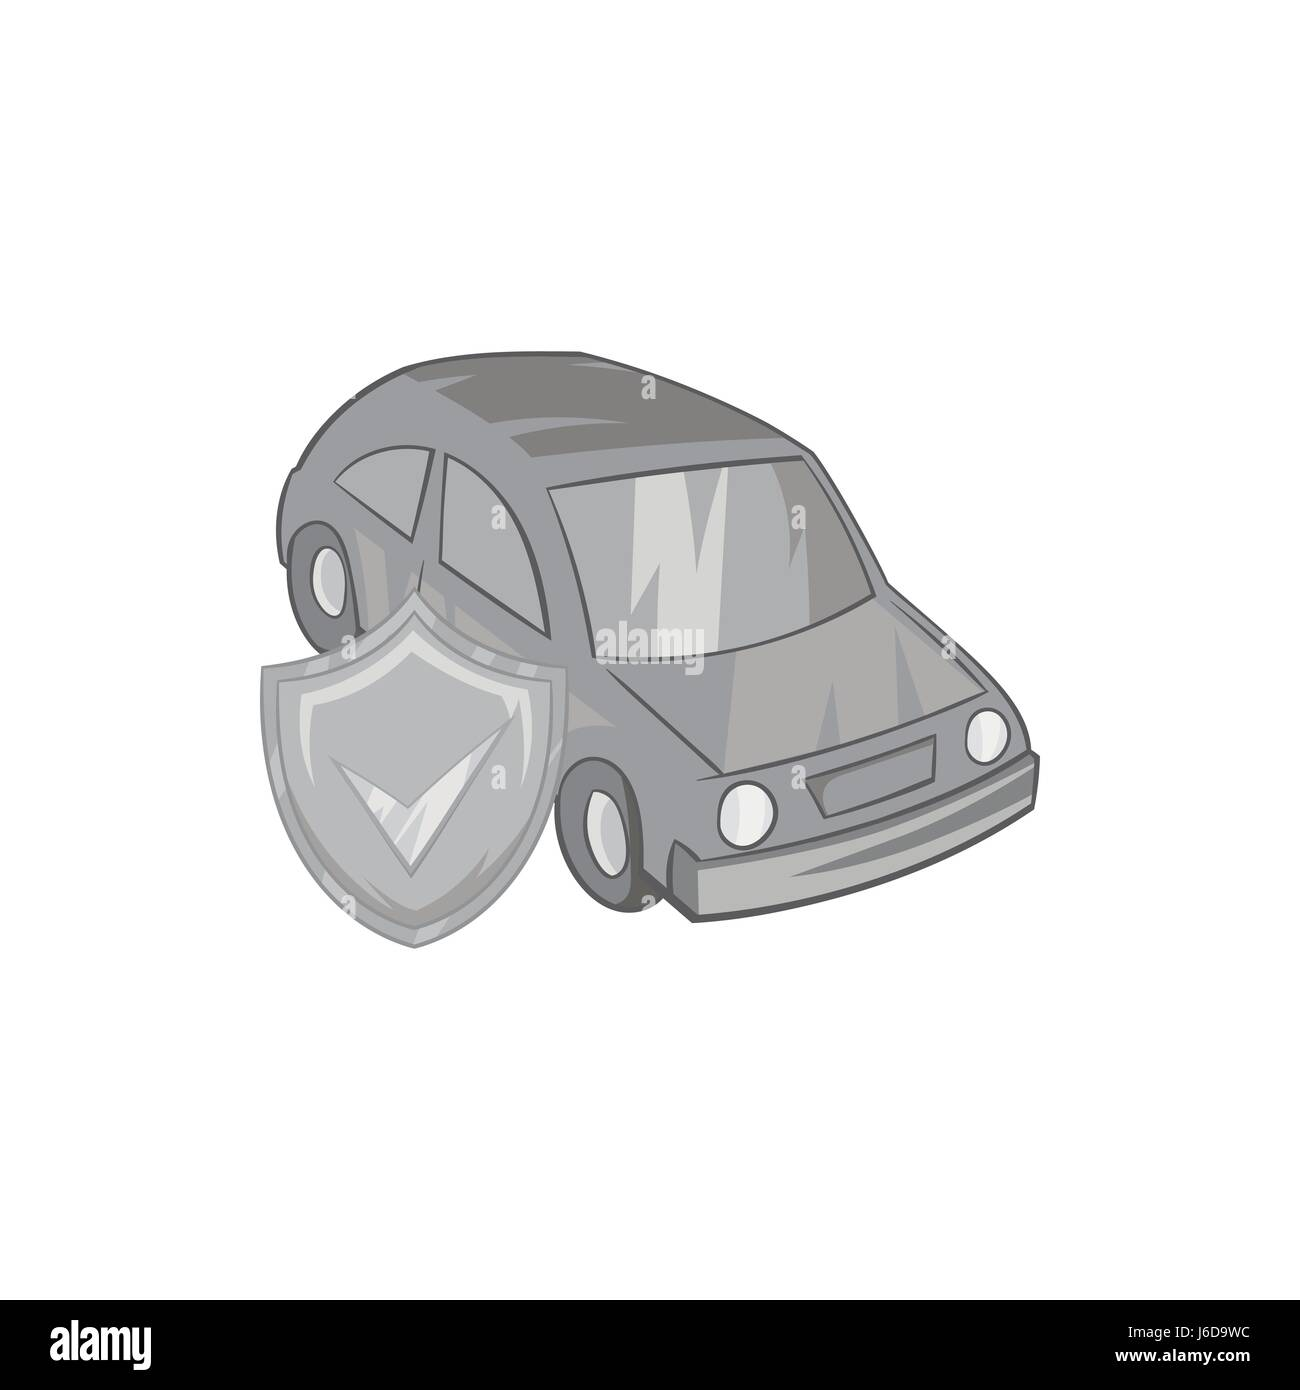 Car insurance icon, black monochrome style Stock Vector